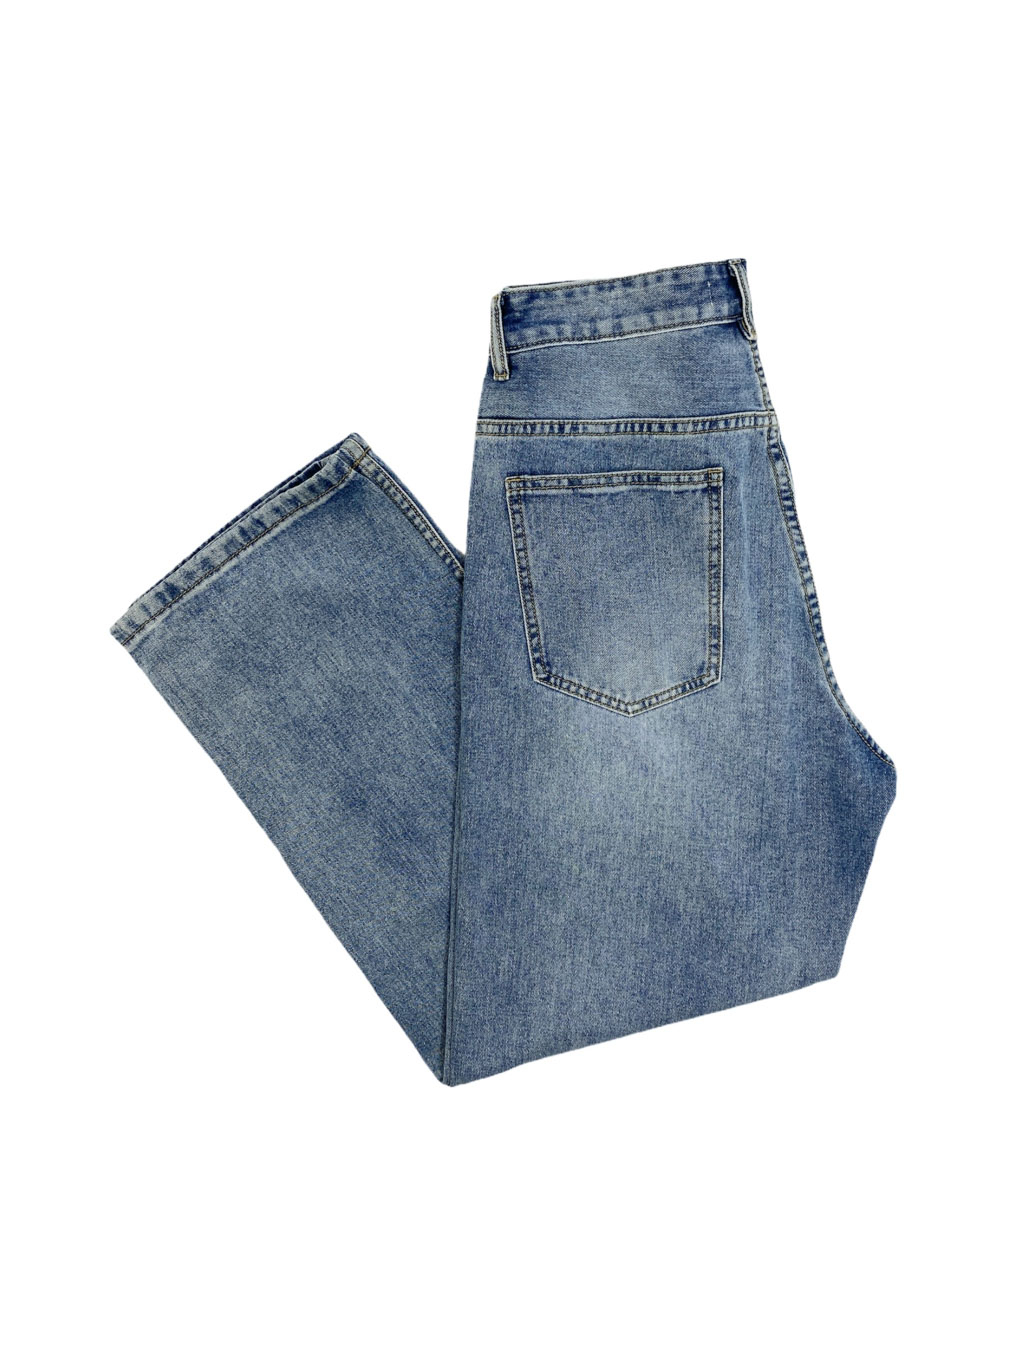 TRF Jeans (Blue)-M